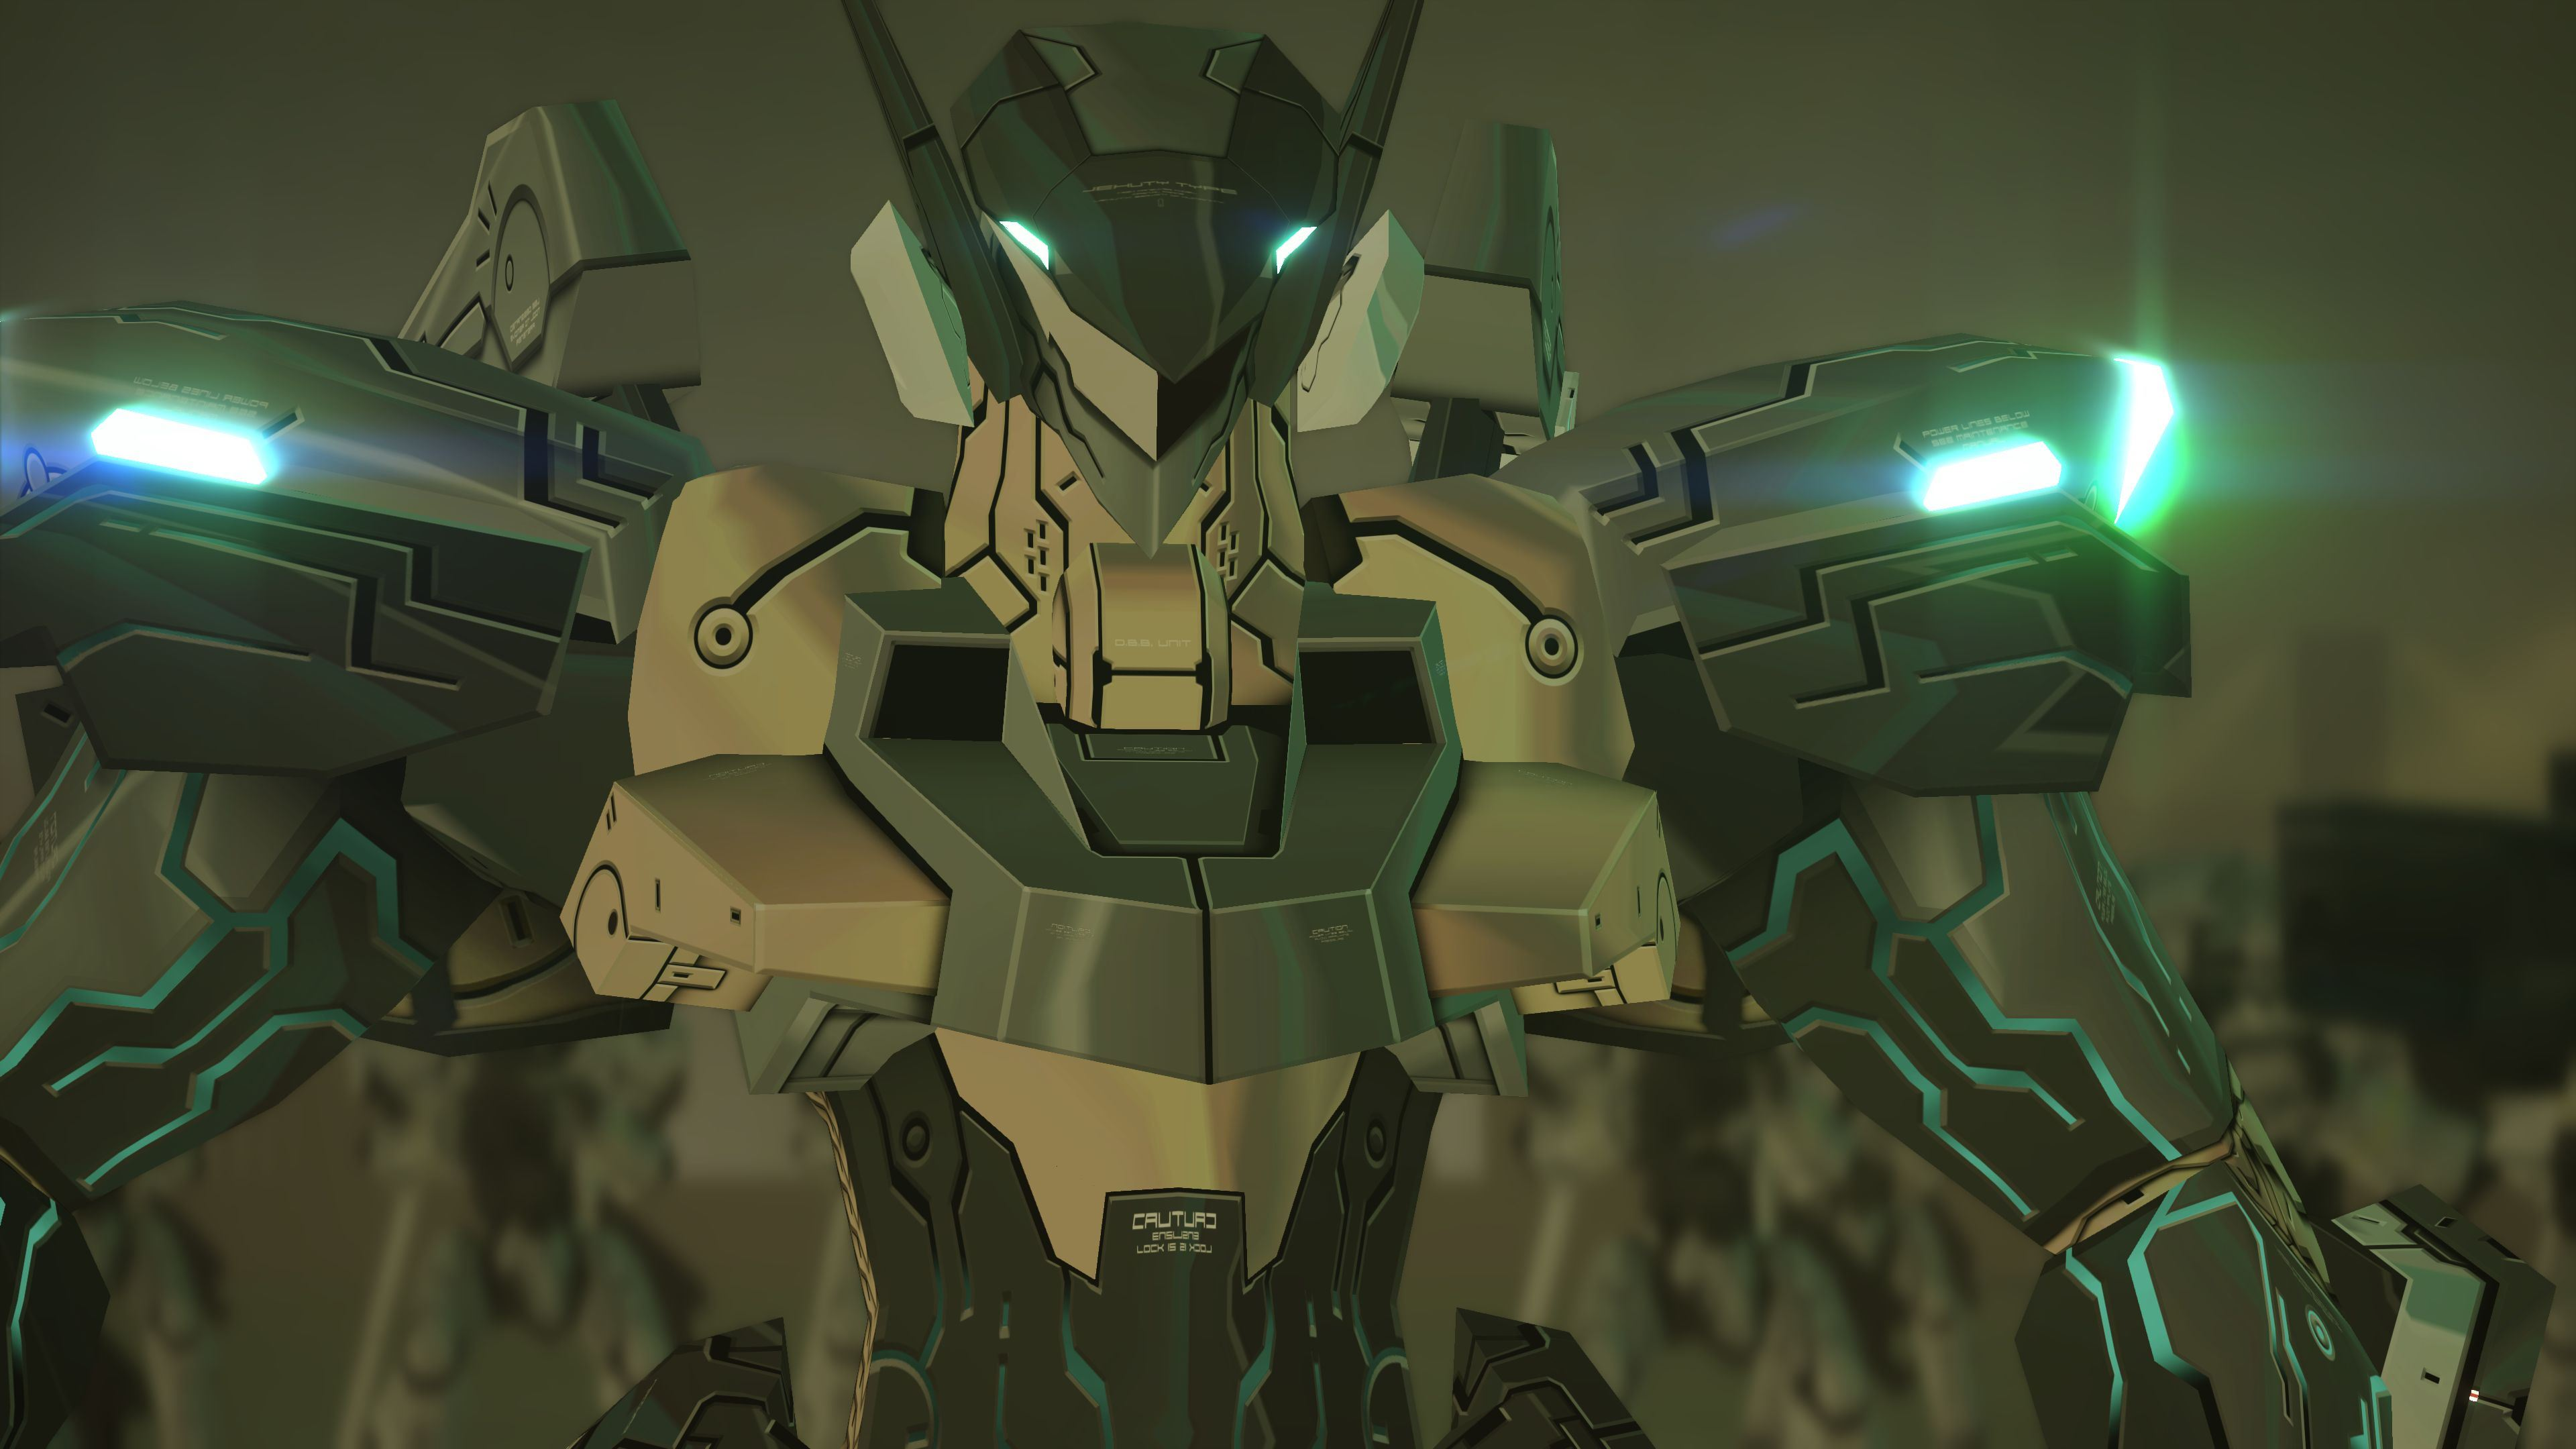 Zone of the Enders: The 2nd Runner MRS выйдет на PC и PS4 с поддержкой VR